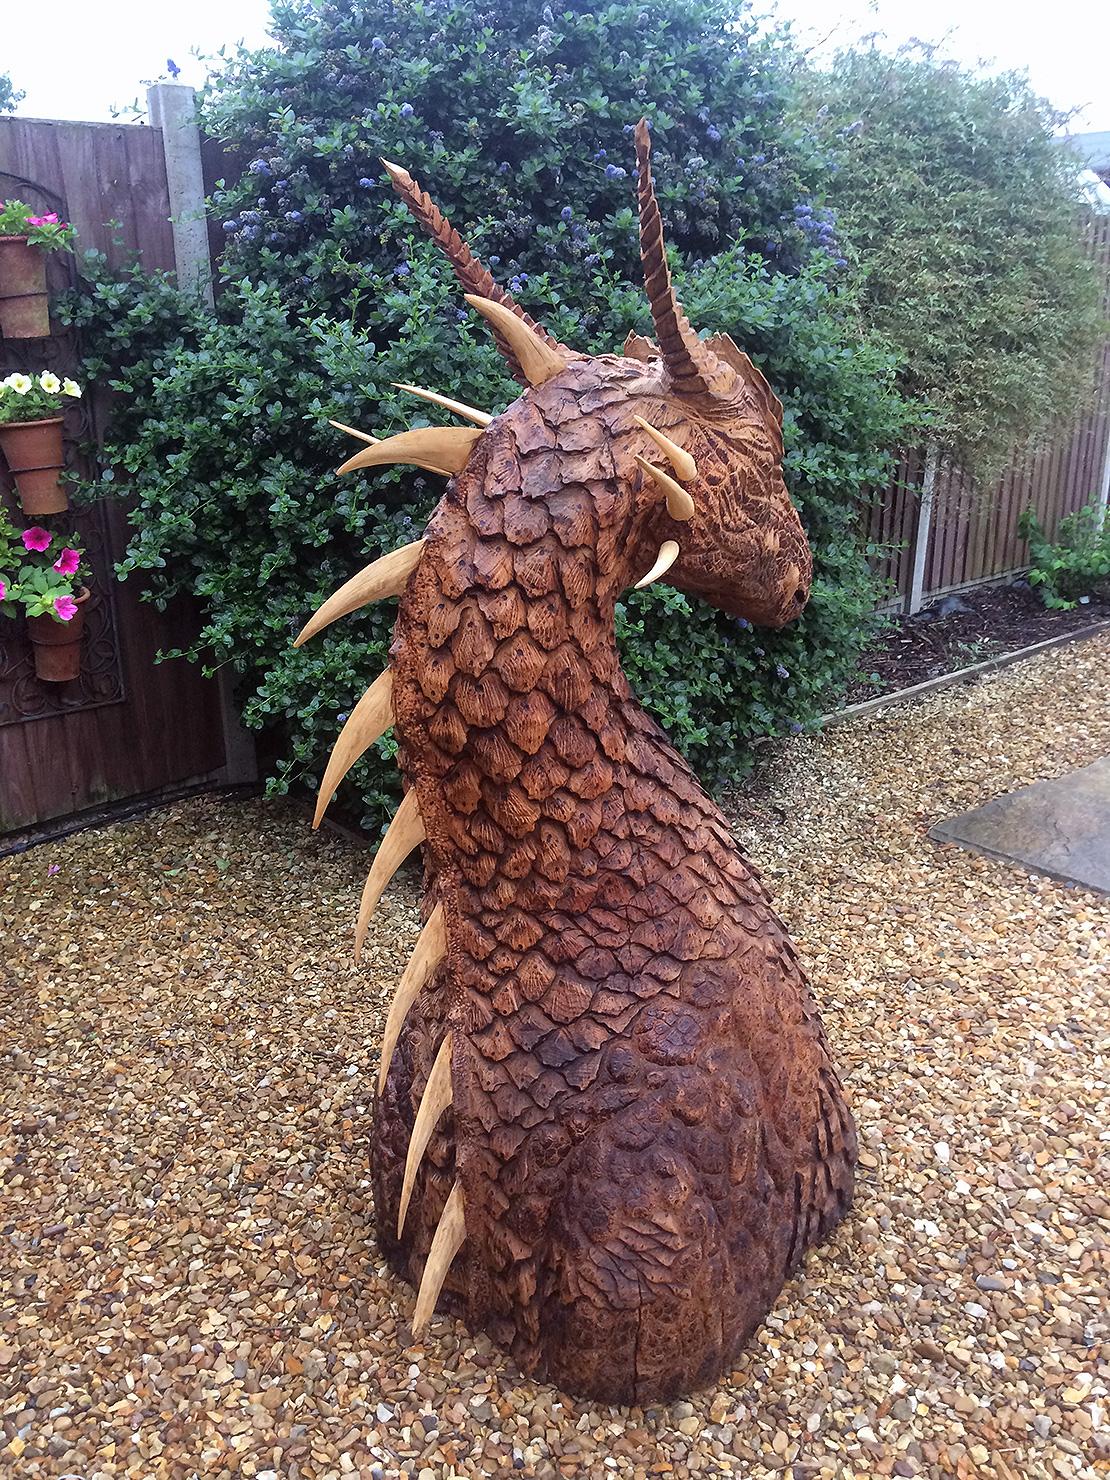 Small dragon head sculpture